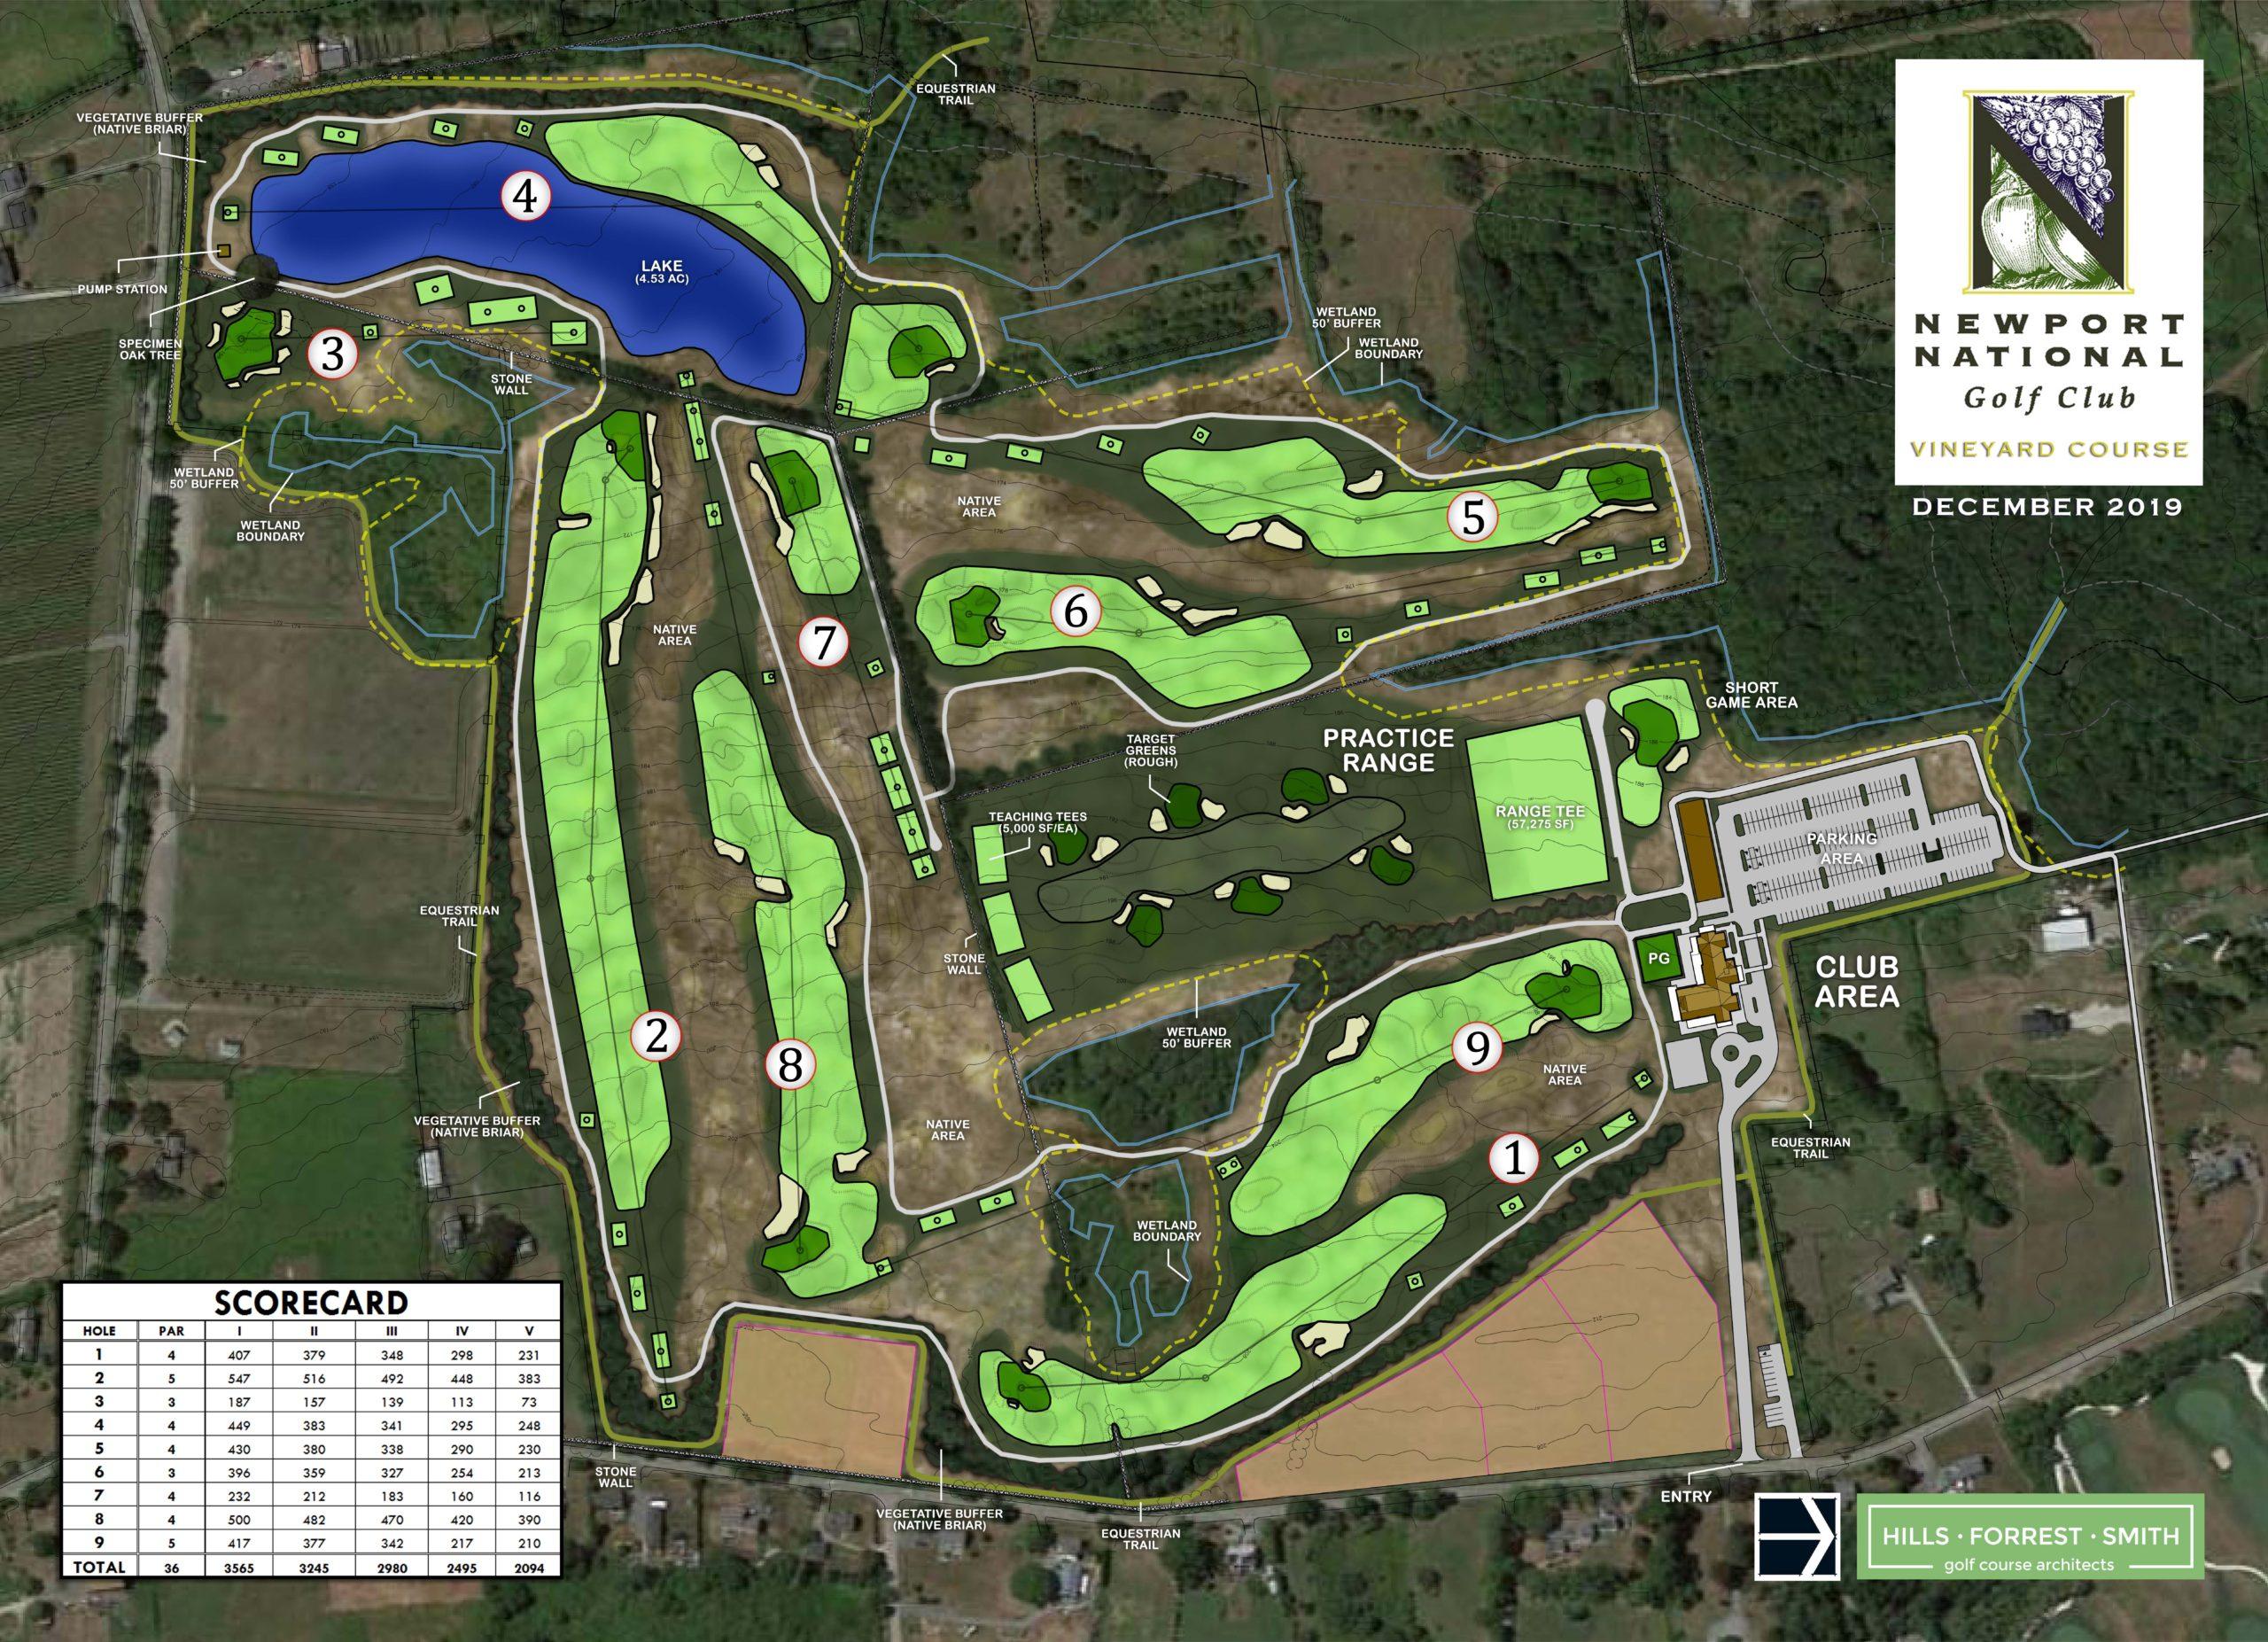 Vineyard Course 9 Holes at Newport National Golf Club